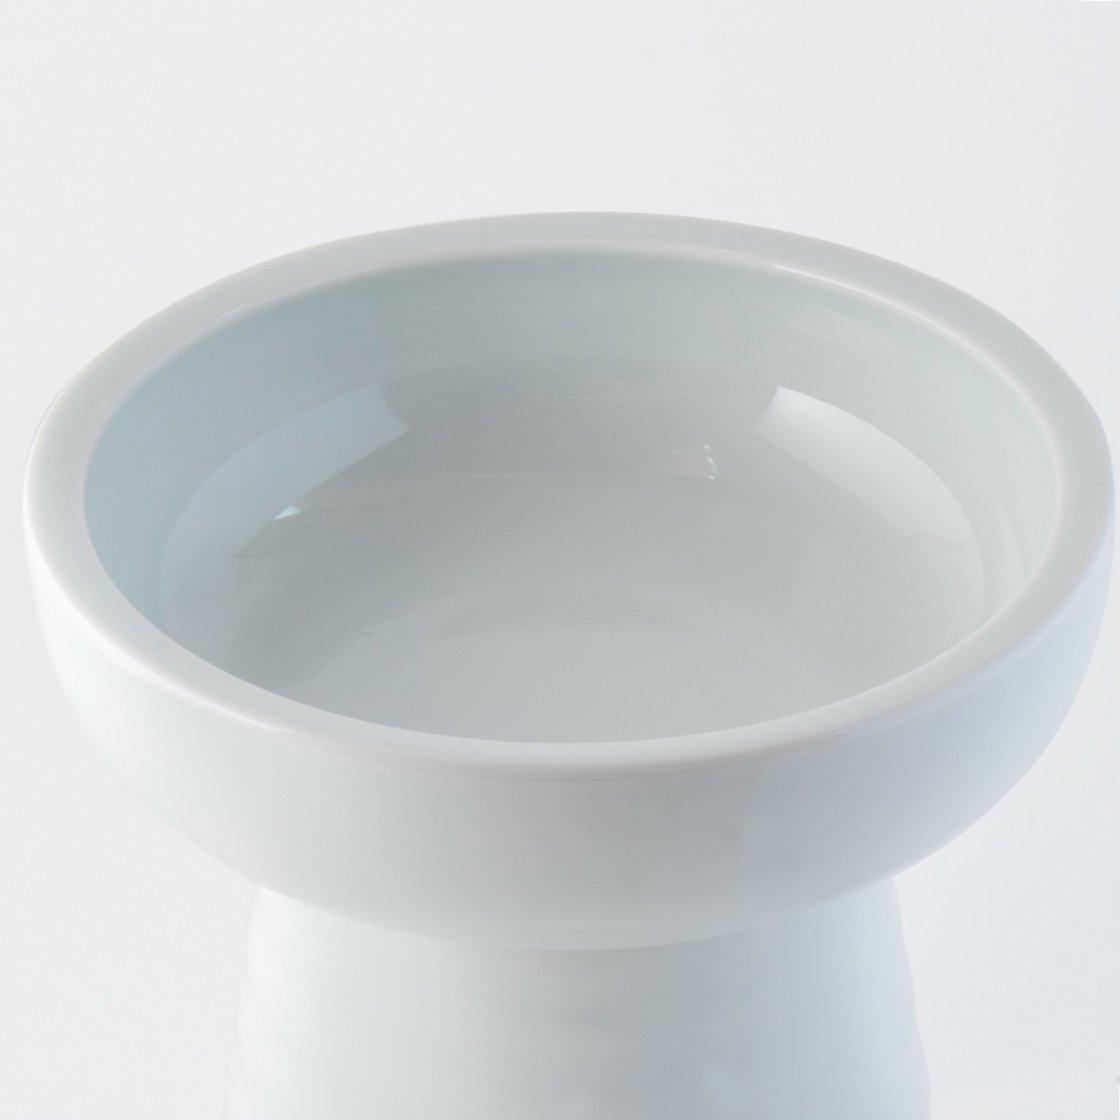 Classy Bowl【5インチ】白磁 Made in Japan